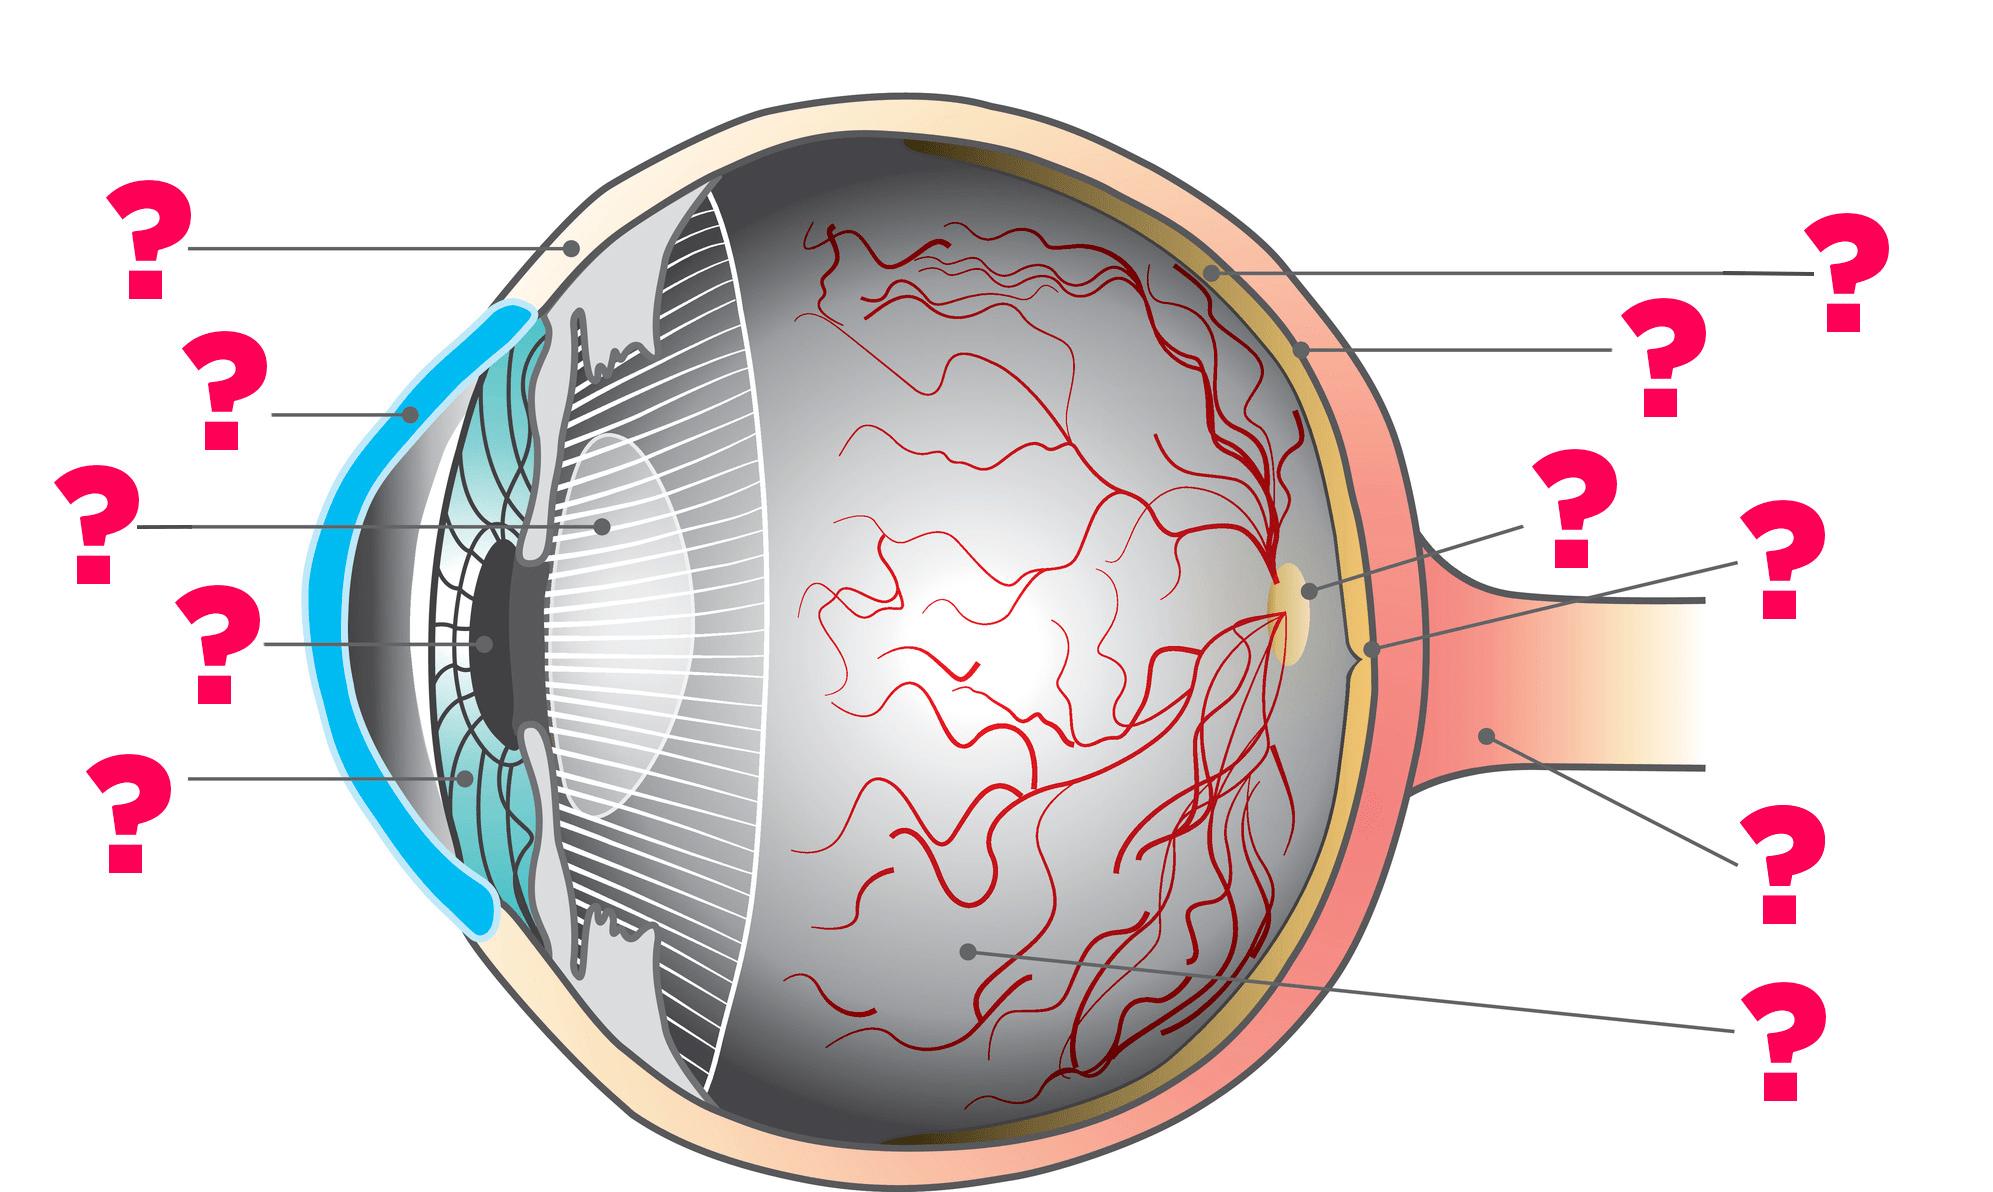 eye diagram quiz game ngs wiring diagram cerebral cortex diagram quiz can you get 11 11 [ 1993 x 1192 Pixel ]